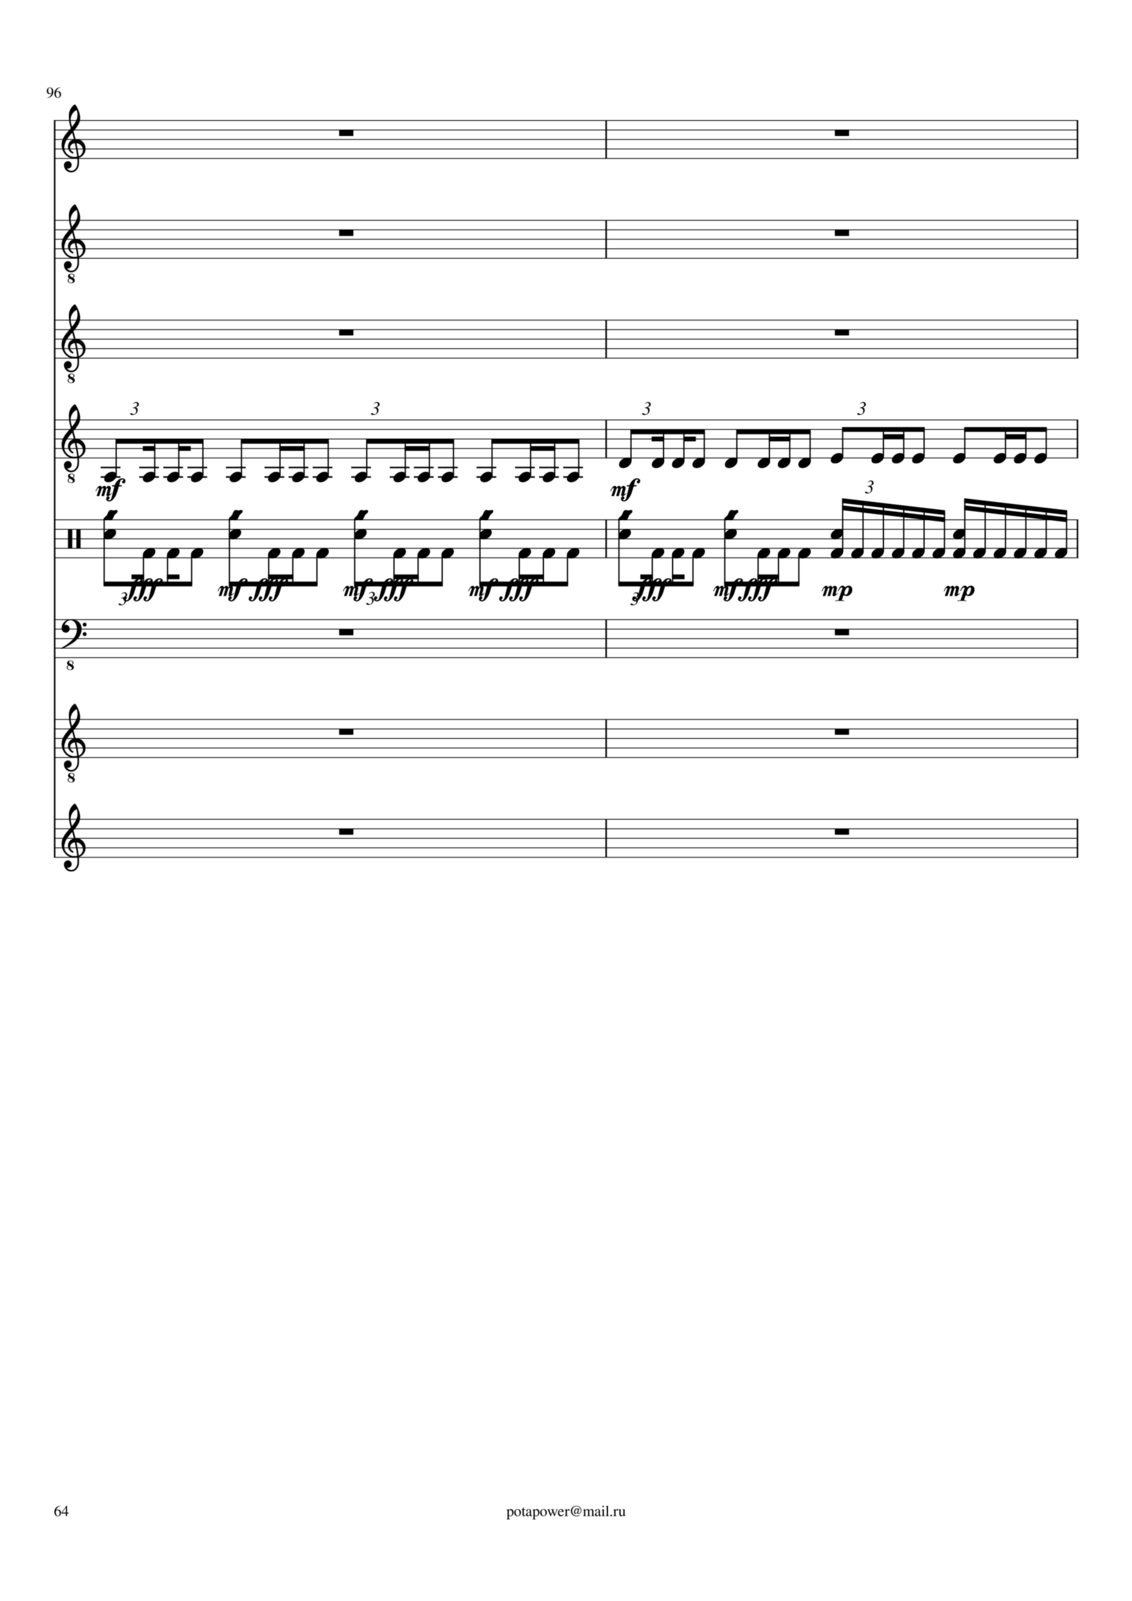 Korolevstvo slez slide, Image 64